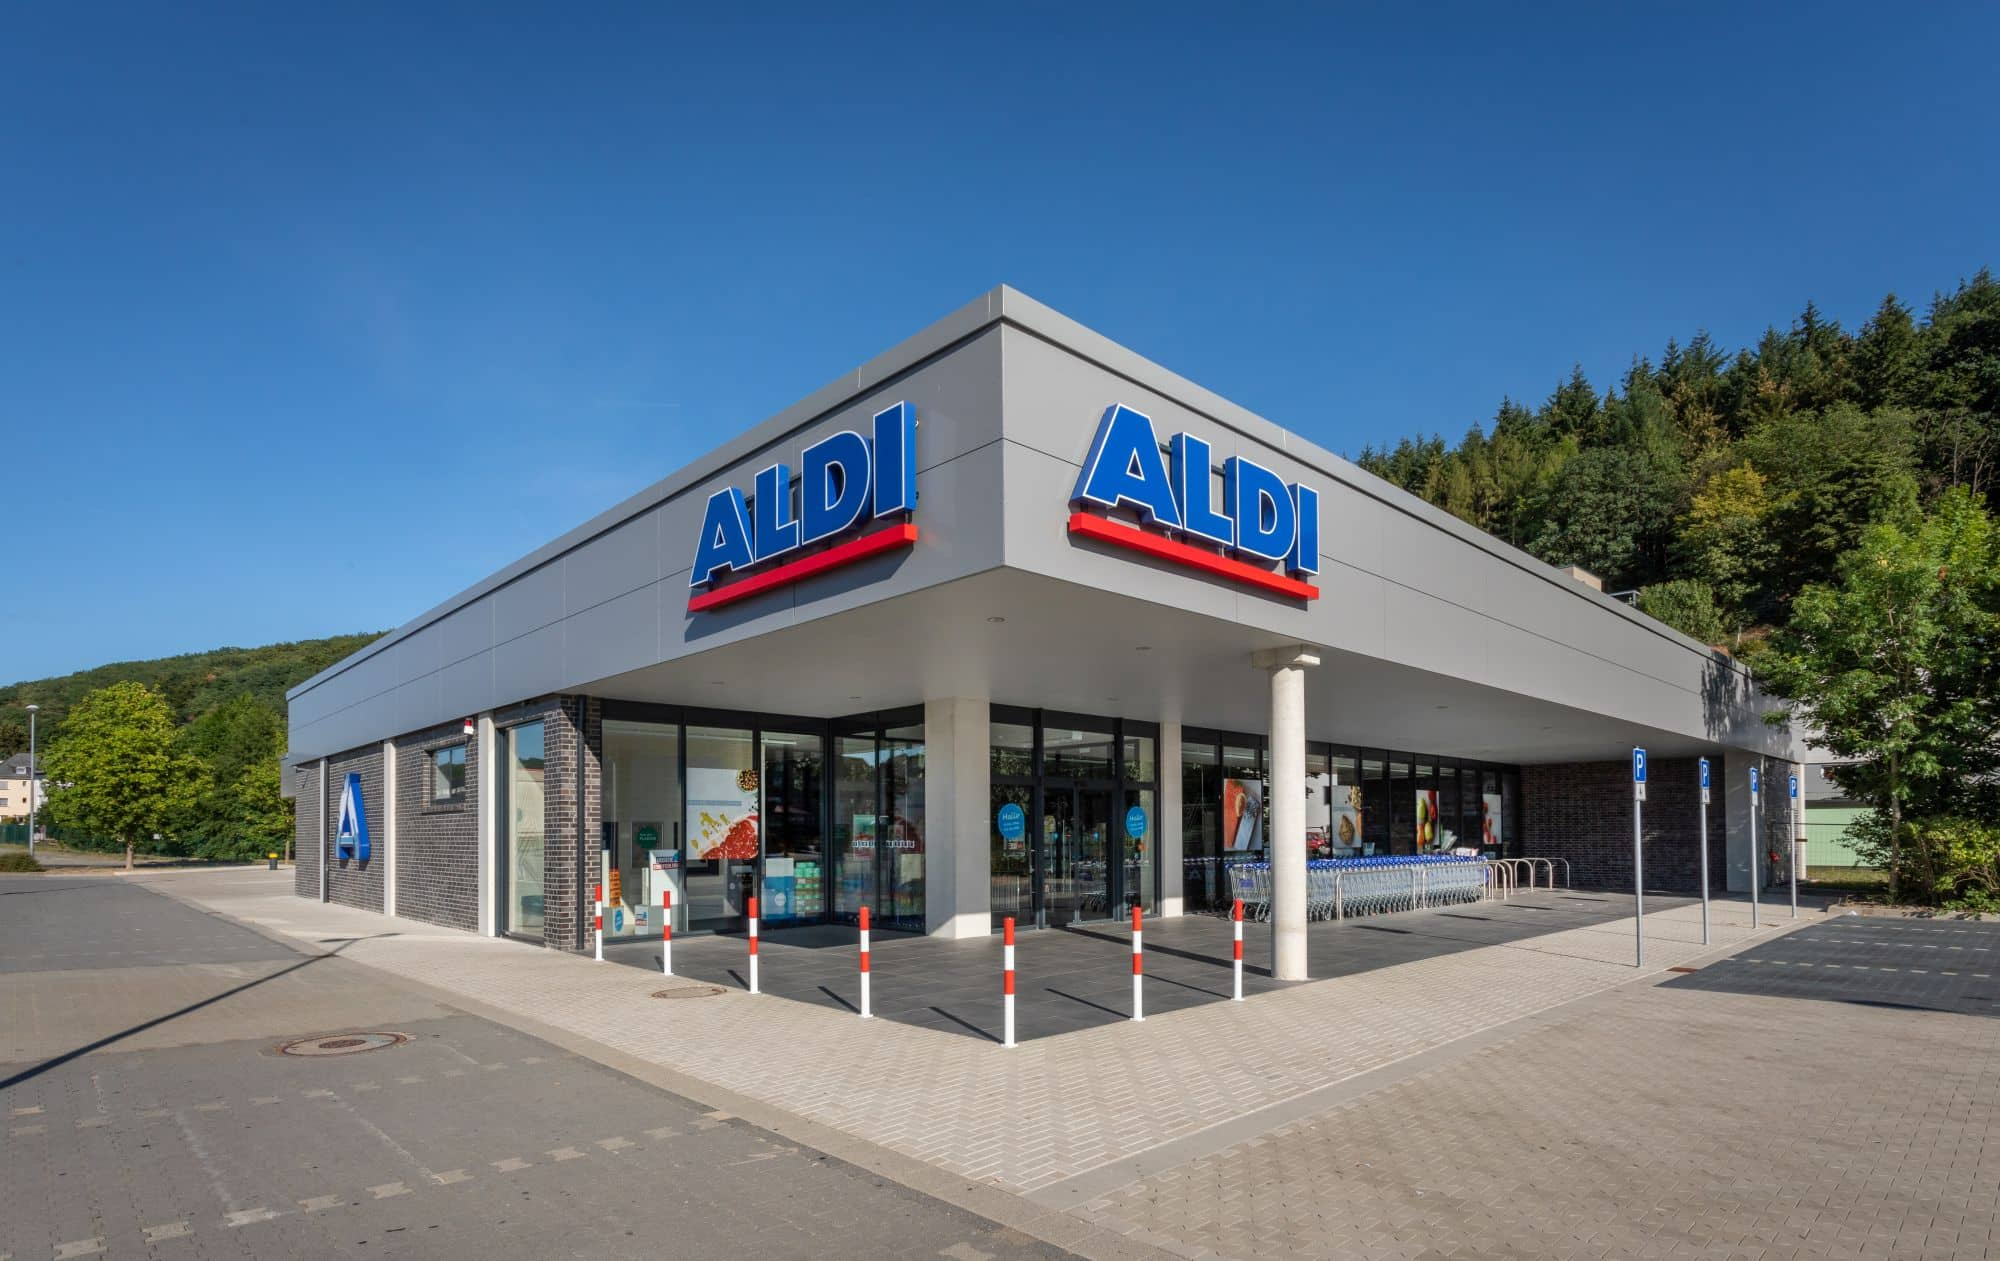 ALDI-Markt | 2017